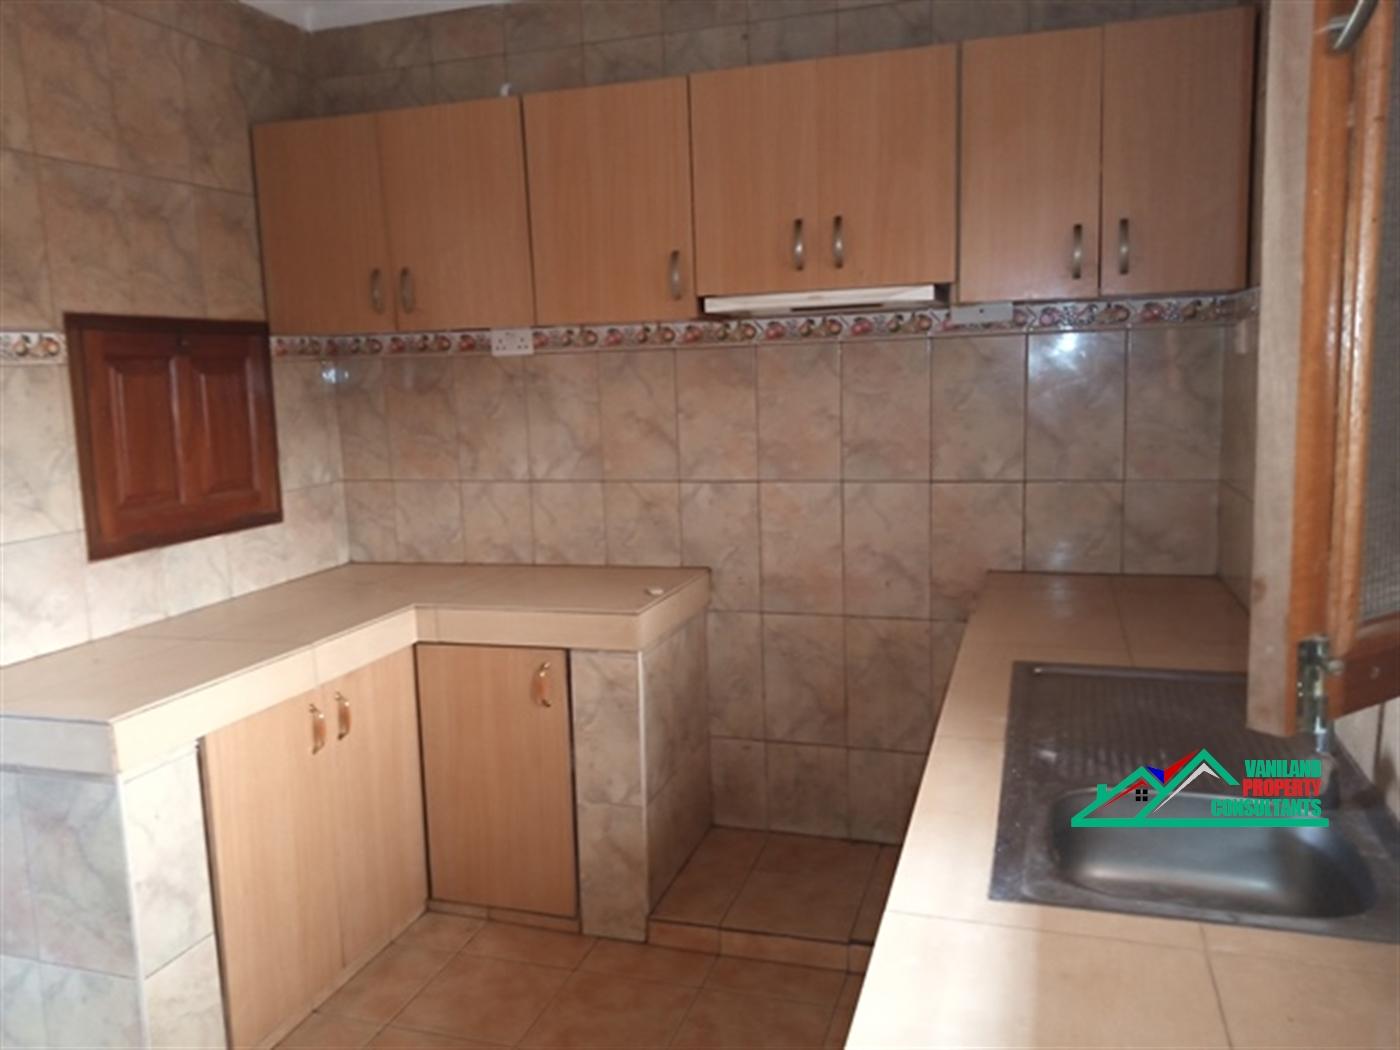 Apartment for rent in Bukoto Wakiso